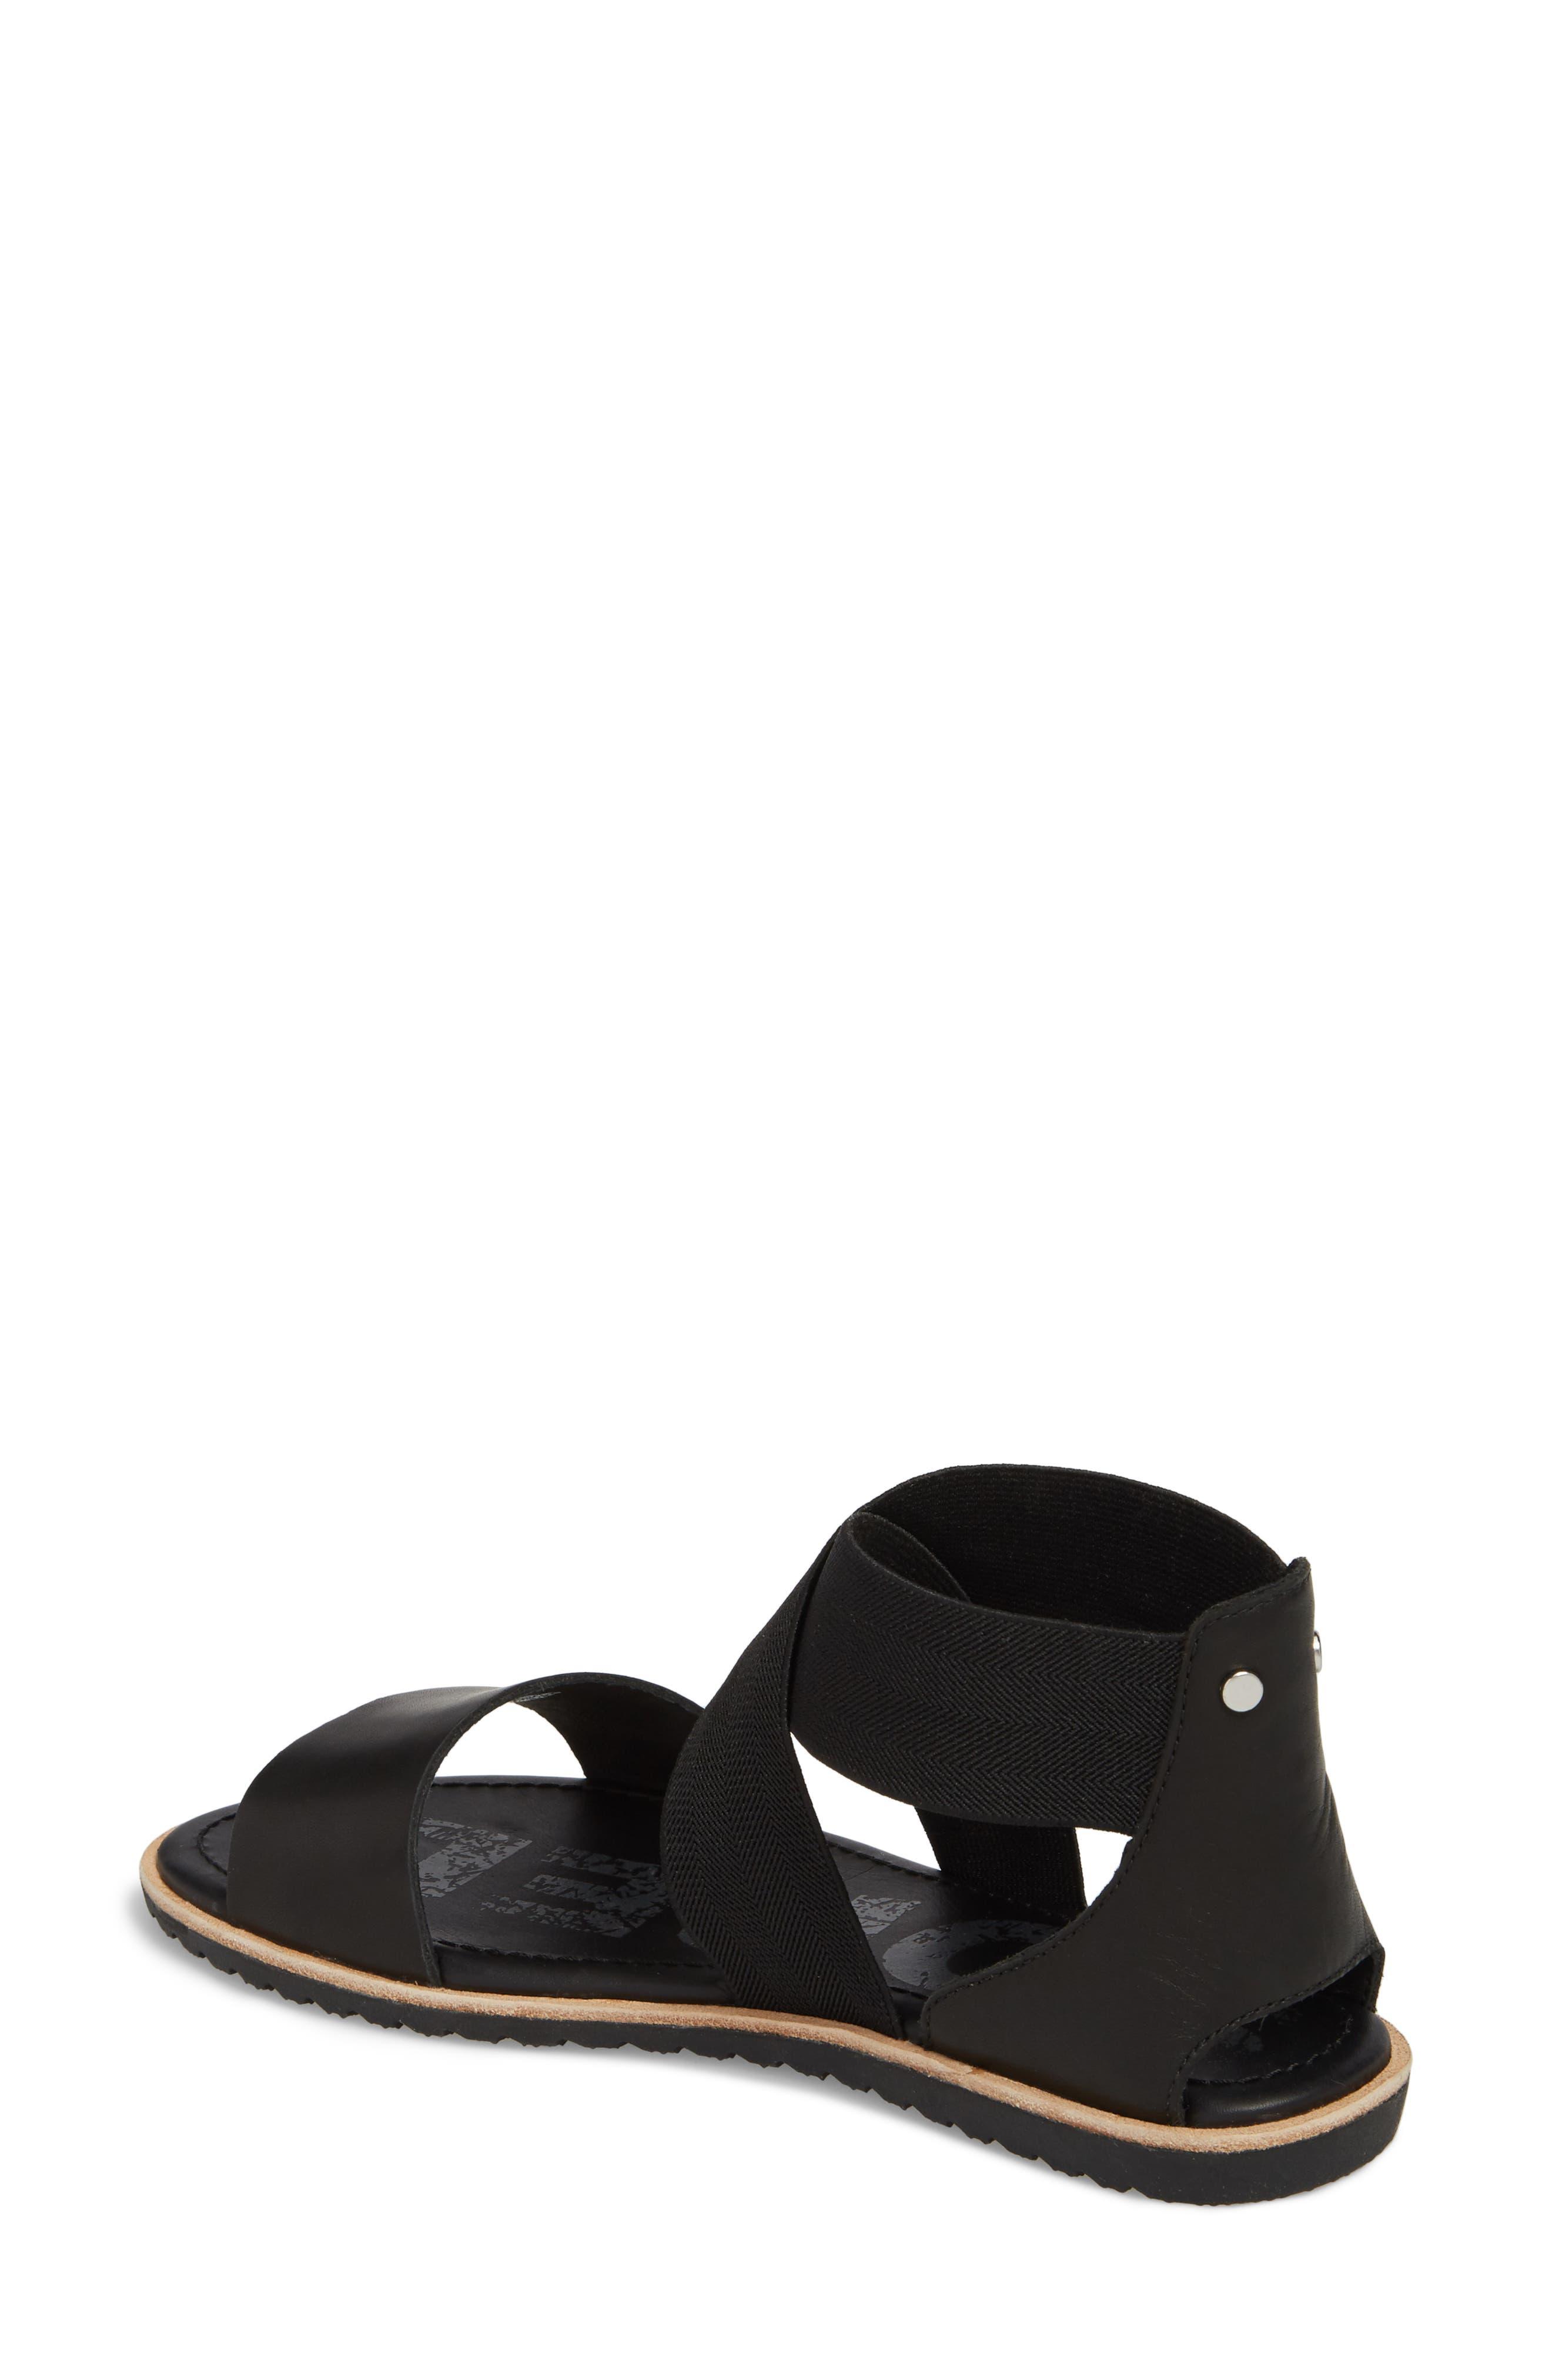 7d3b6438e Women s SOREL Sandals